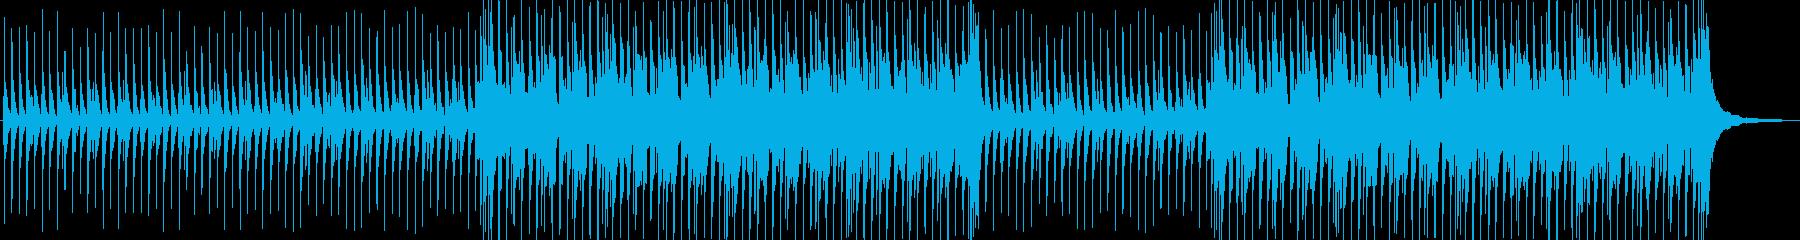 Happy Ukulele 16の再生済みの波形